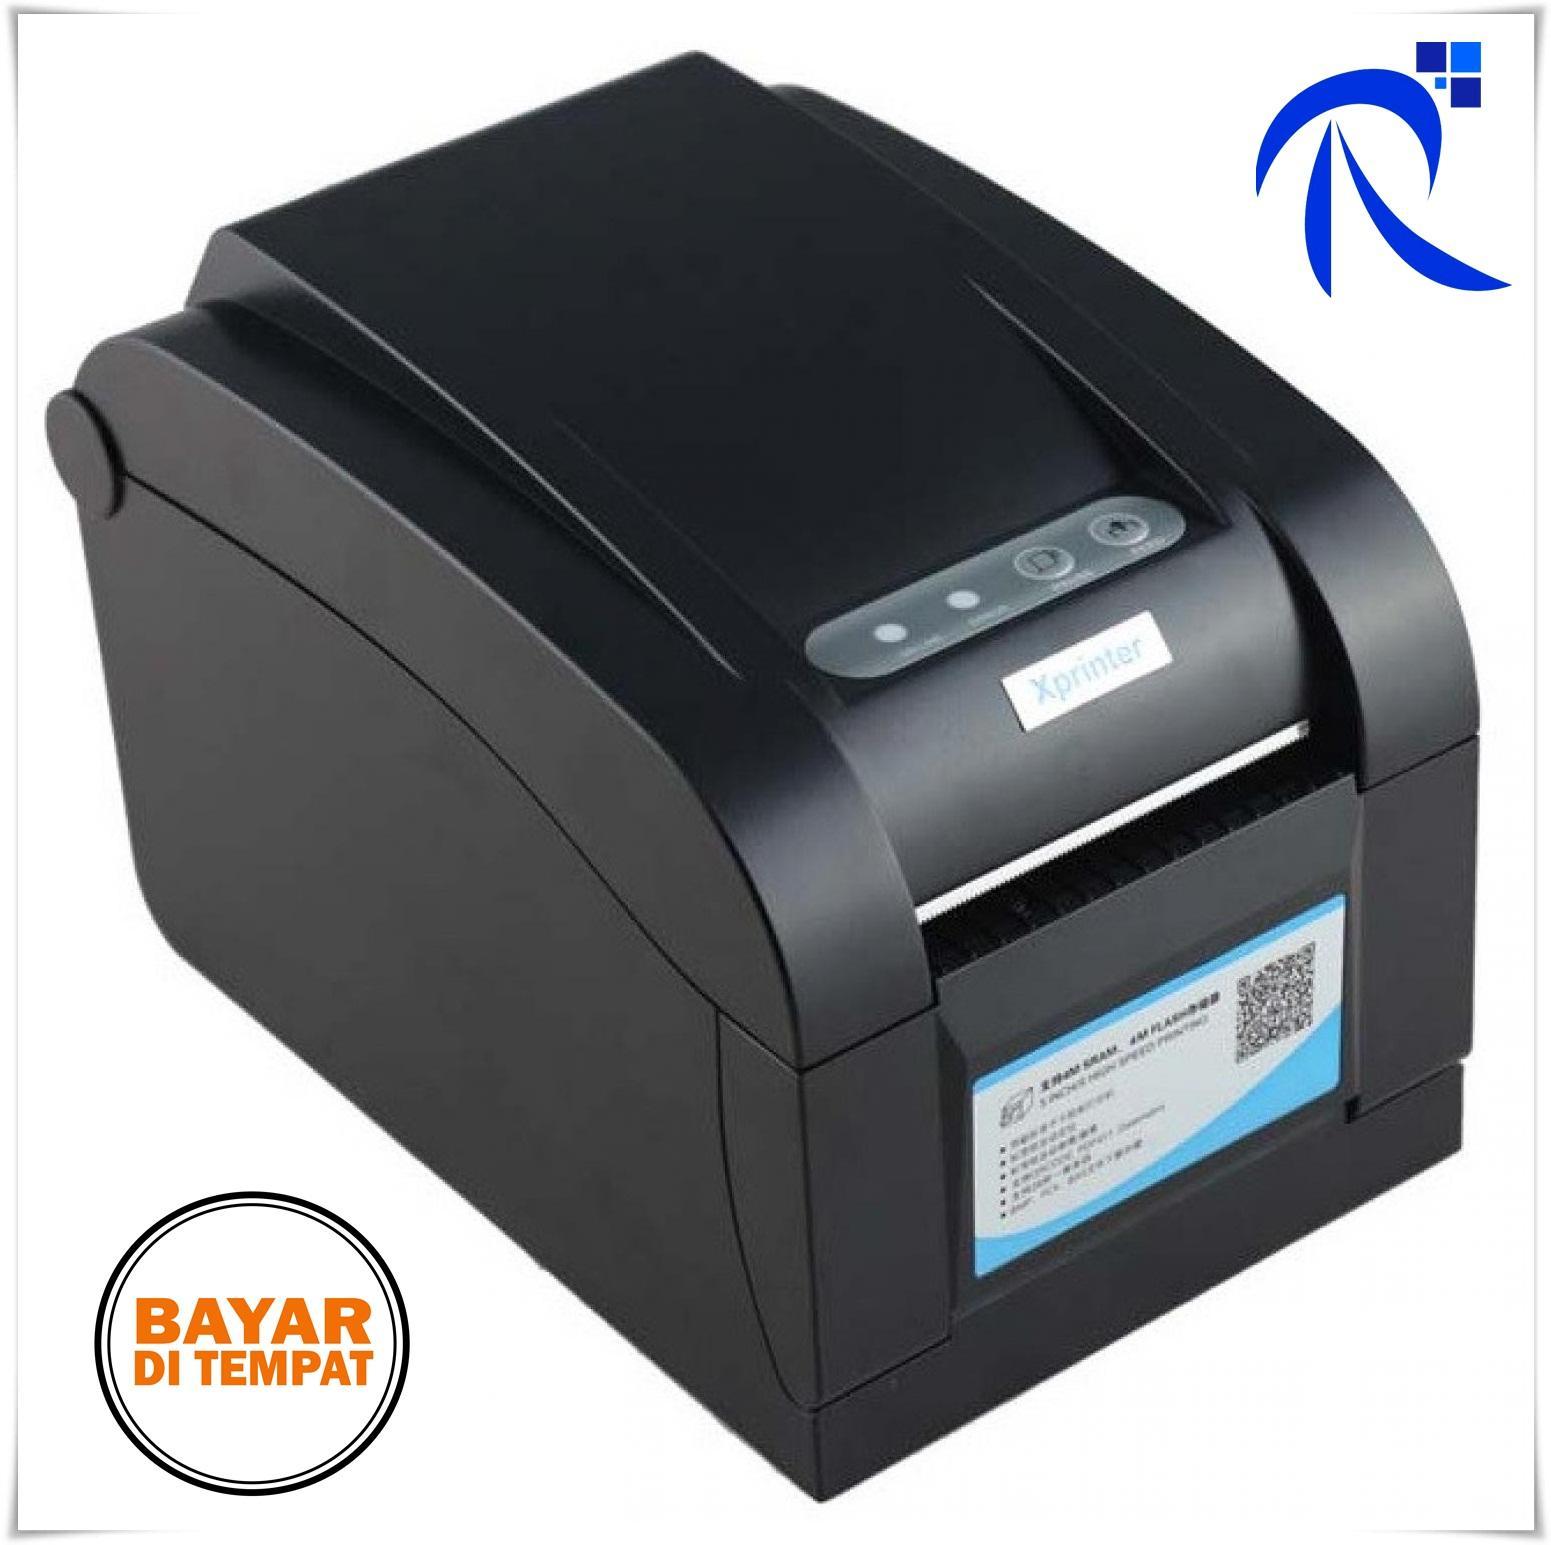 Xprinter Thermal Barcode Printer - XP-350B Hitam Black Kertas Label Stiker Sticker Tingkat Panas Print Printing Cepat Excellent Quality